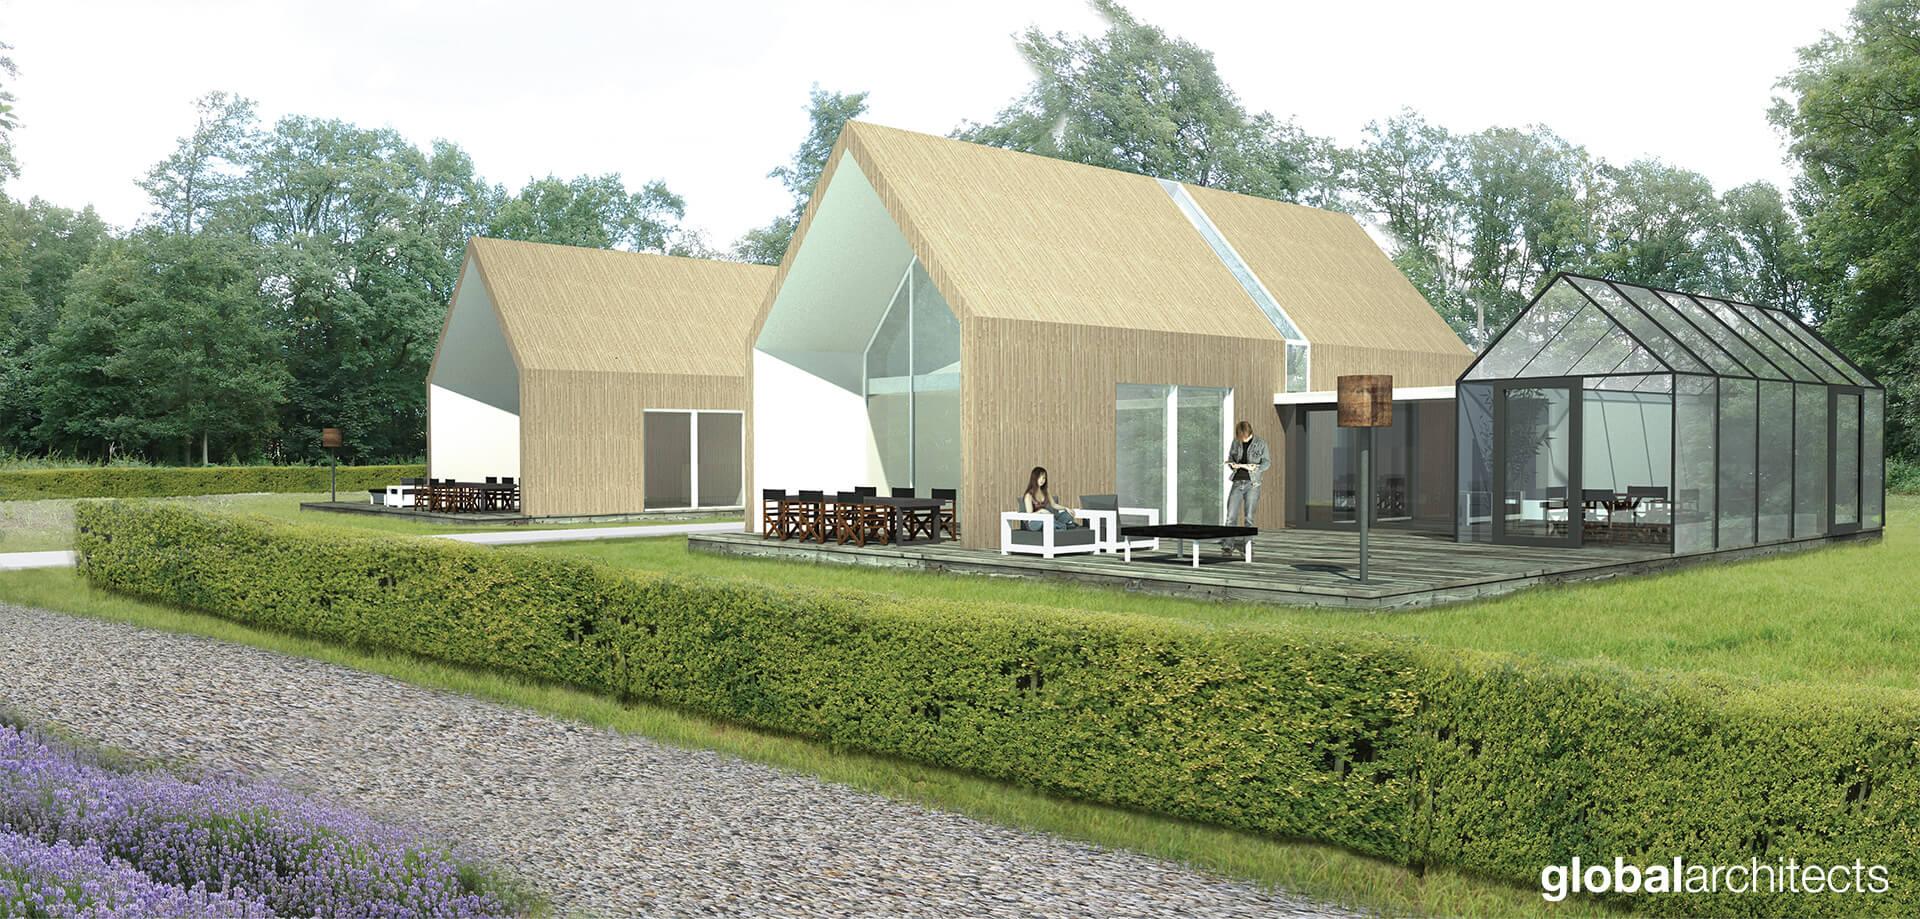 boswoning met kas als wintertuin en duurzame energie opwekking